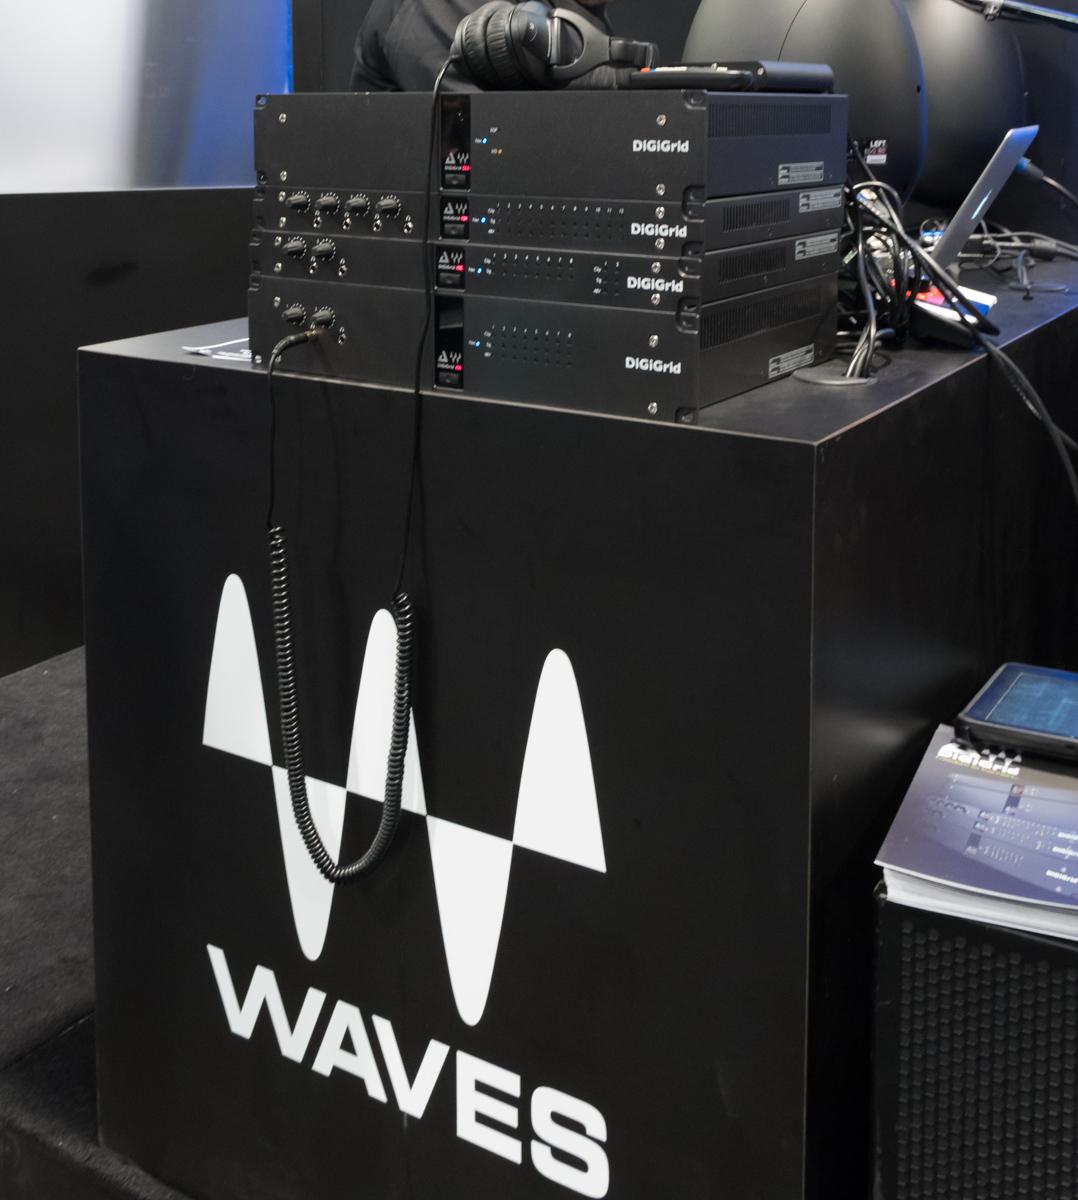 NAMM2015 Day1 : DiGiGrid / Waves